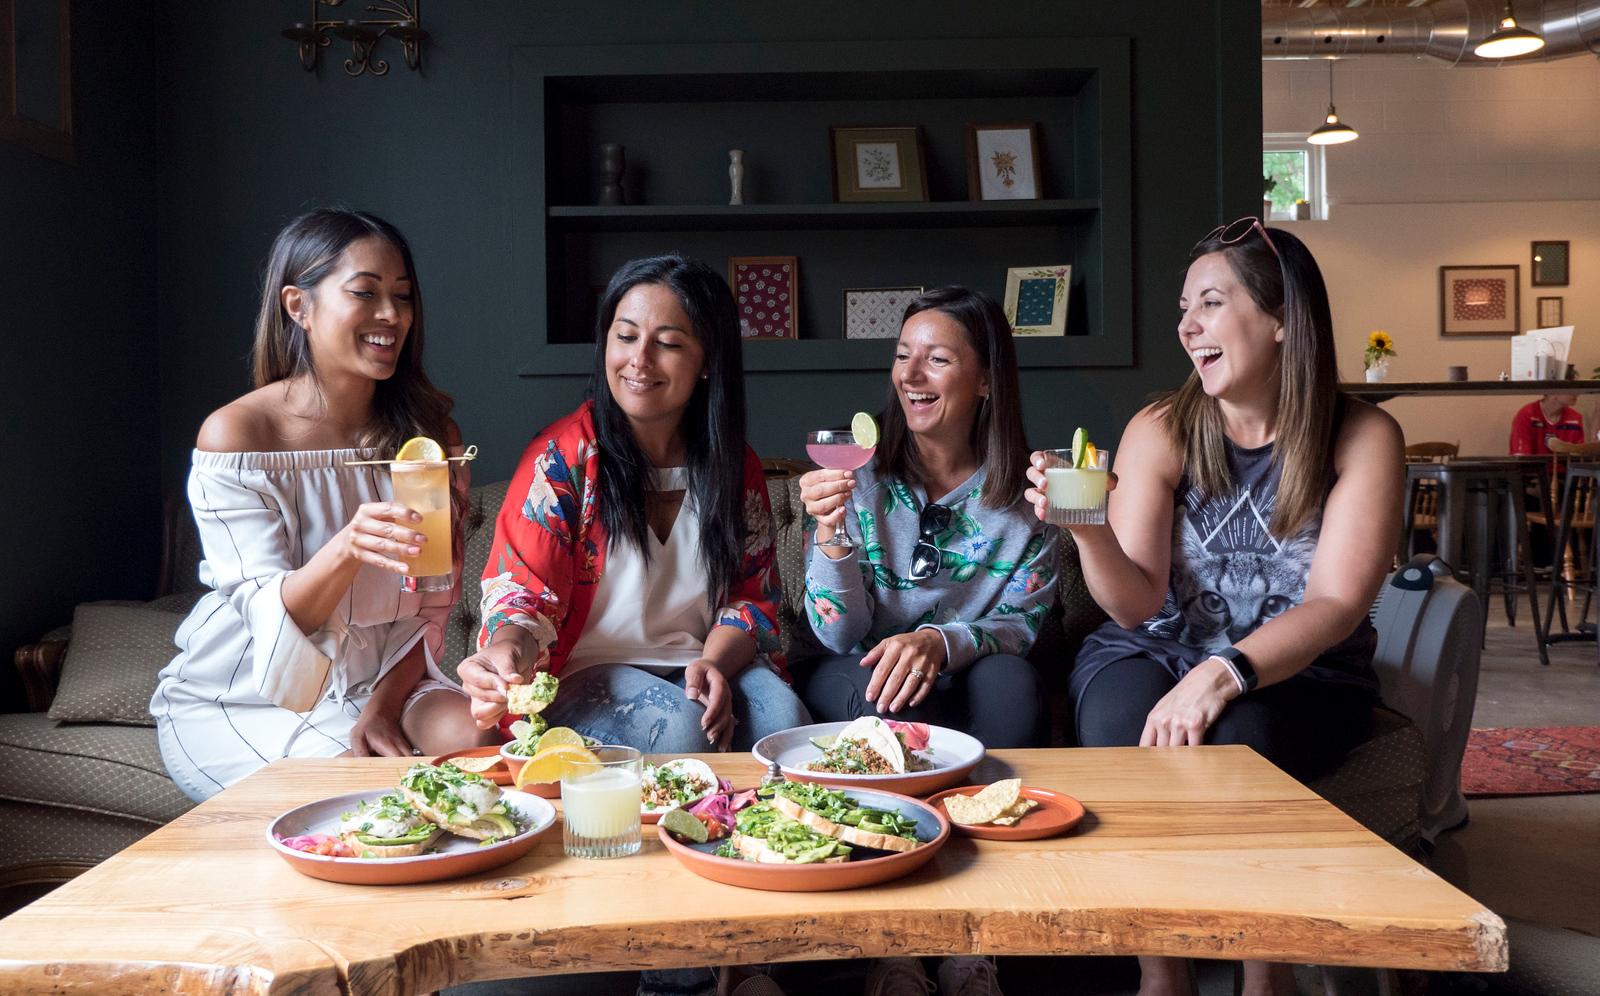 Travel blogging ladies dining at Cafe Mexico in Sarnia, Ontario, Canada.